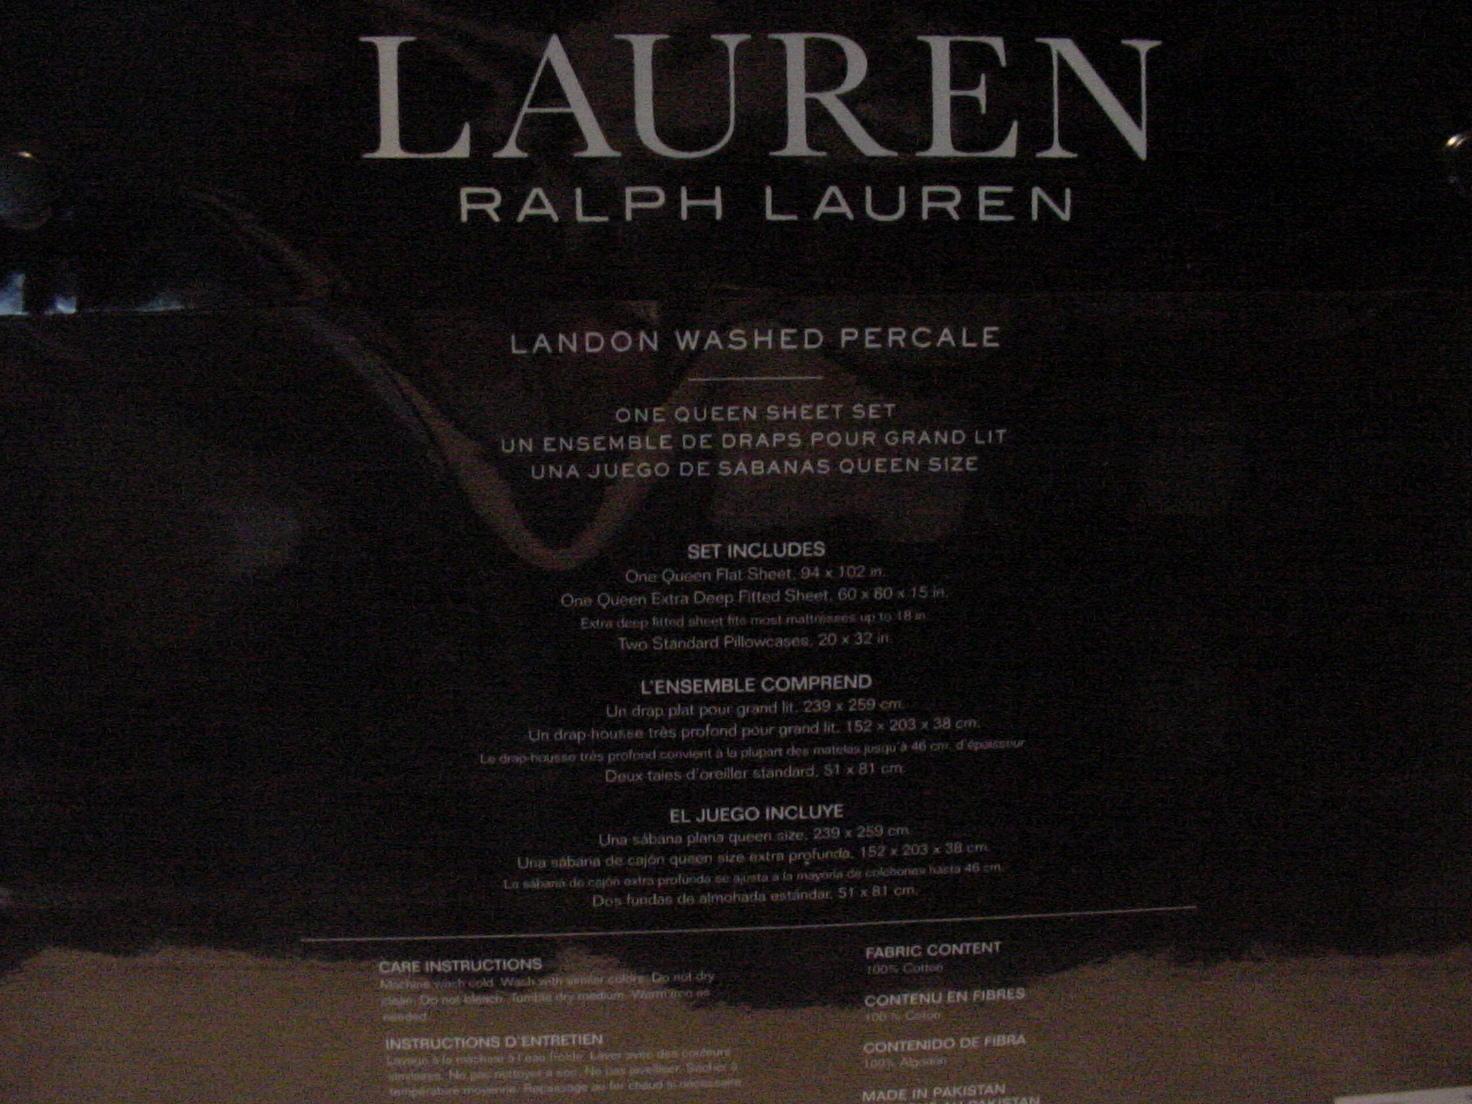 Ralph Lauren Landon Washed Percale White Cotton Sheet Set Queen